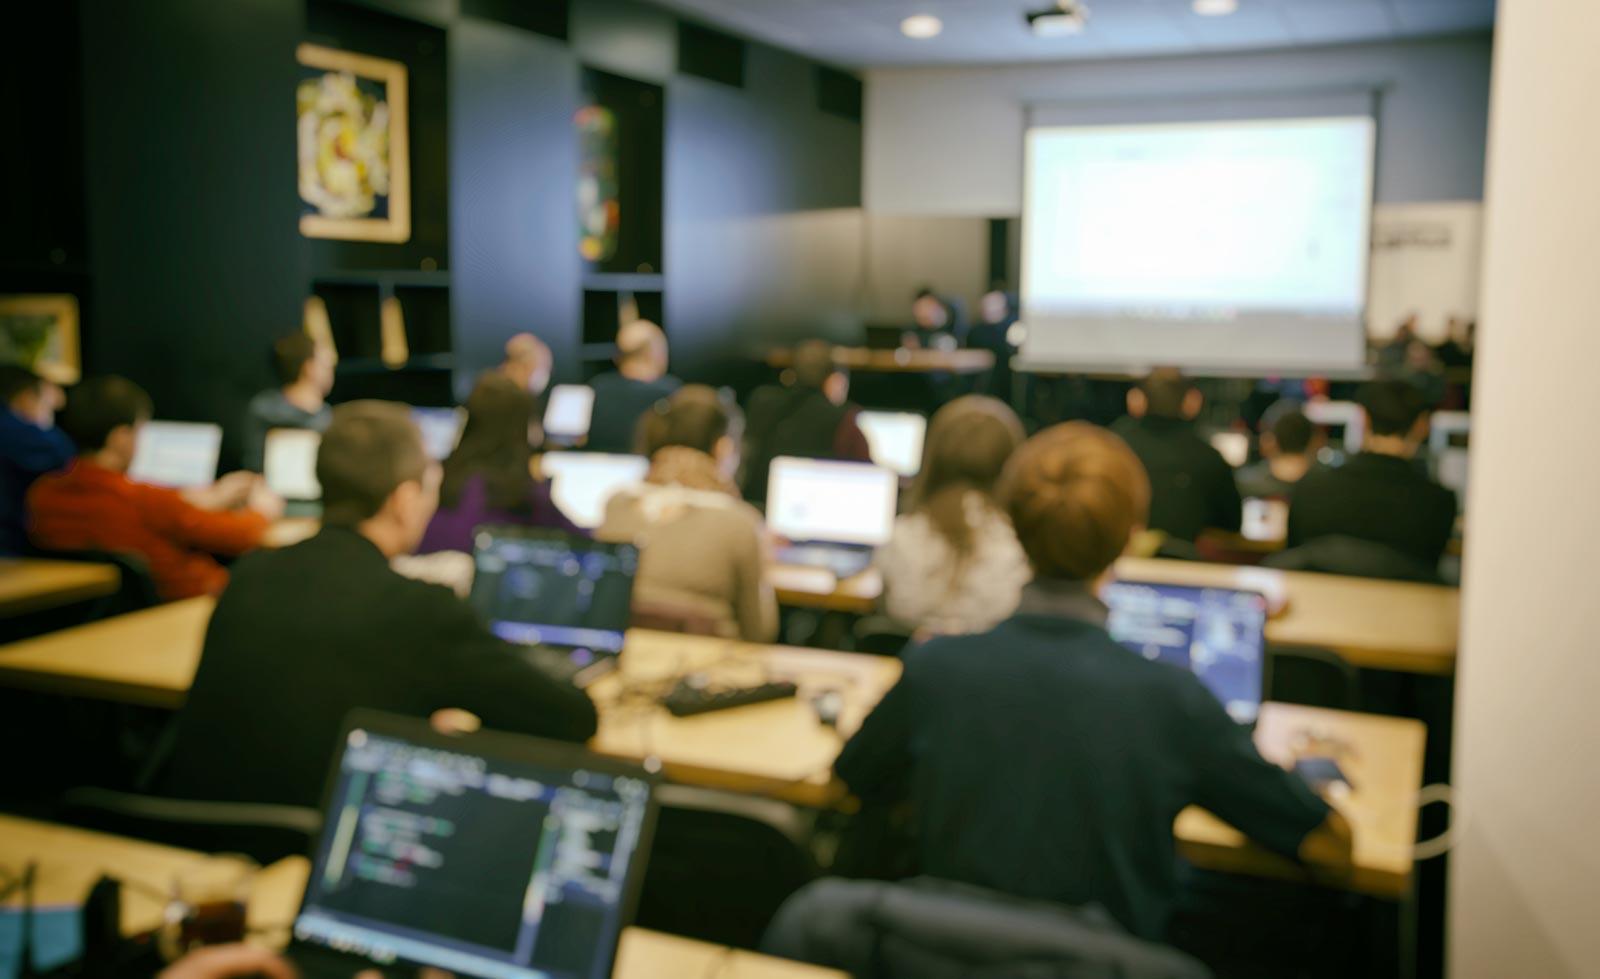 Image many-students-studing-classroom